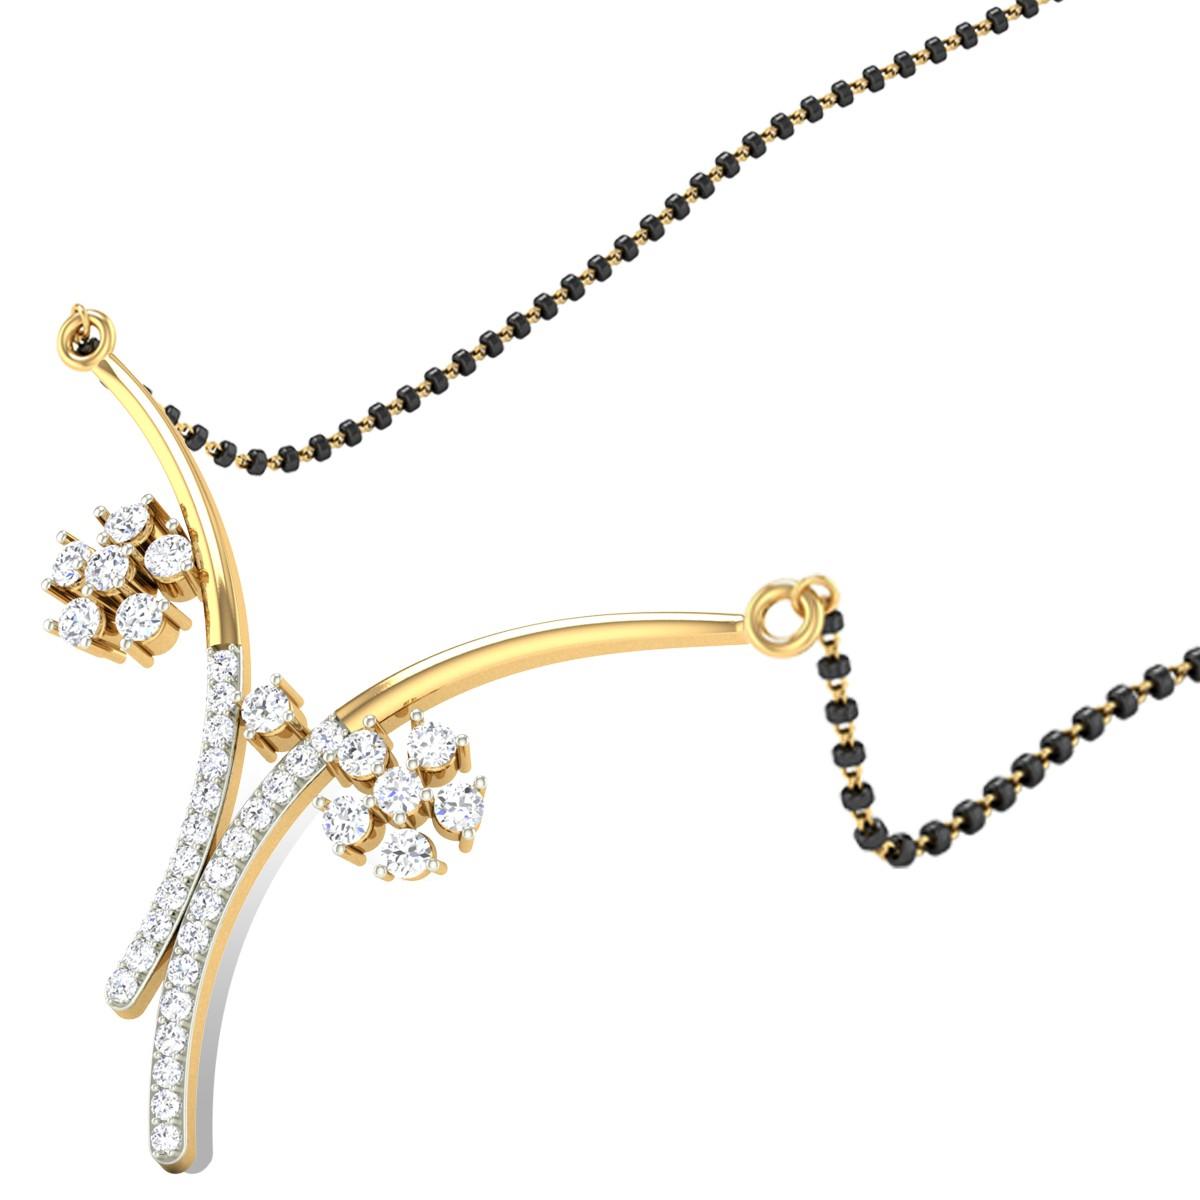 Interlock Orchid Diamond Mangalsutra